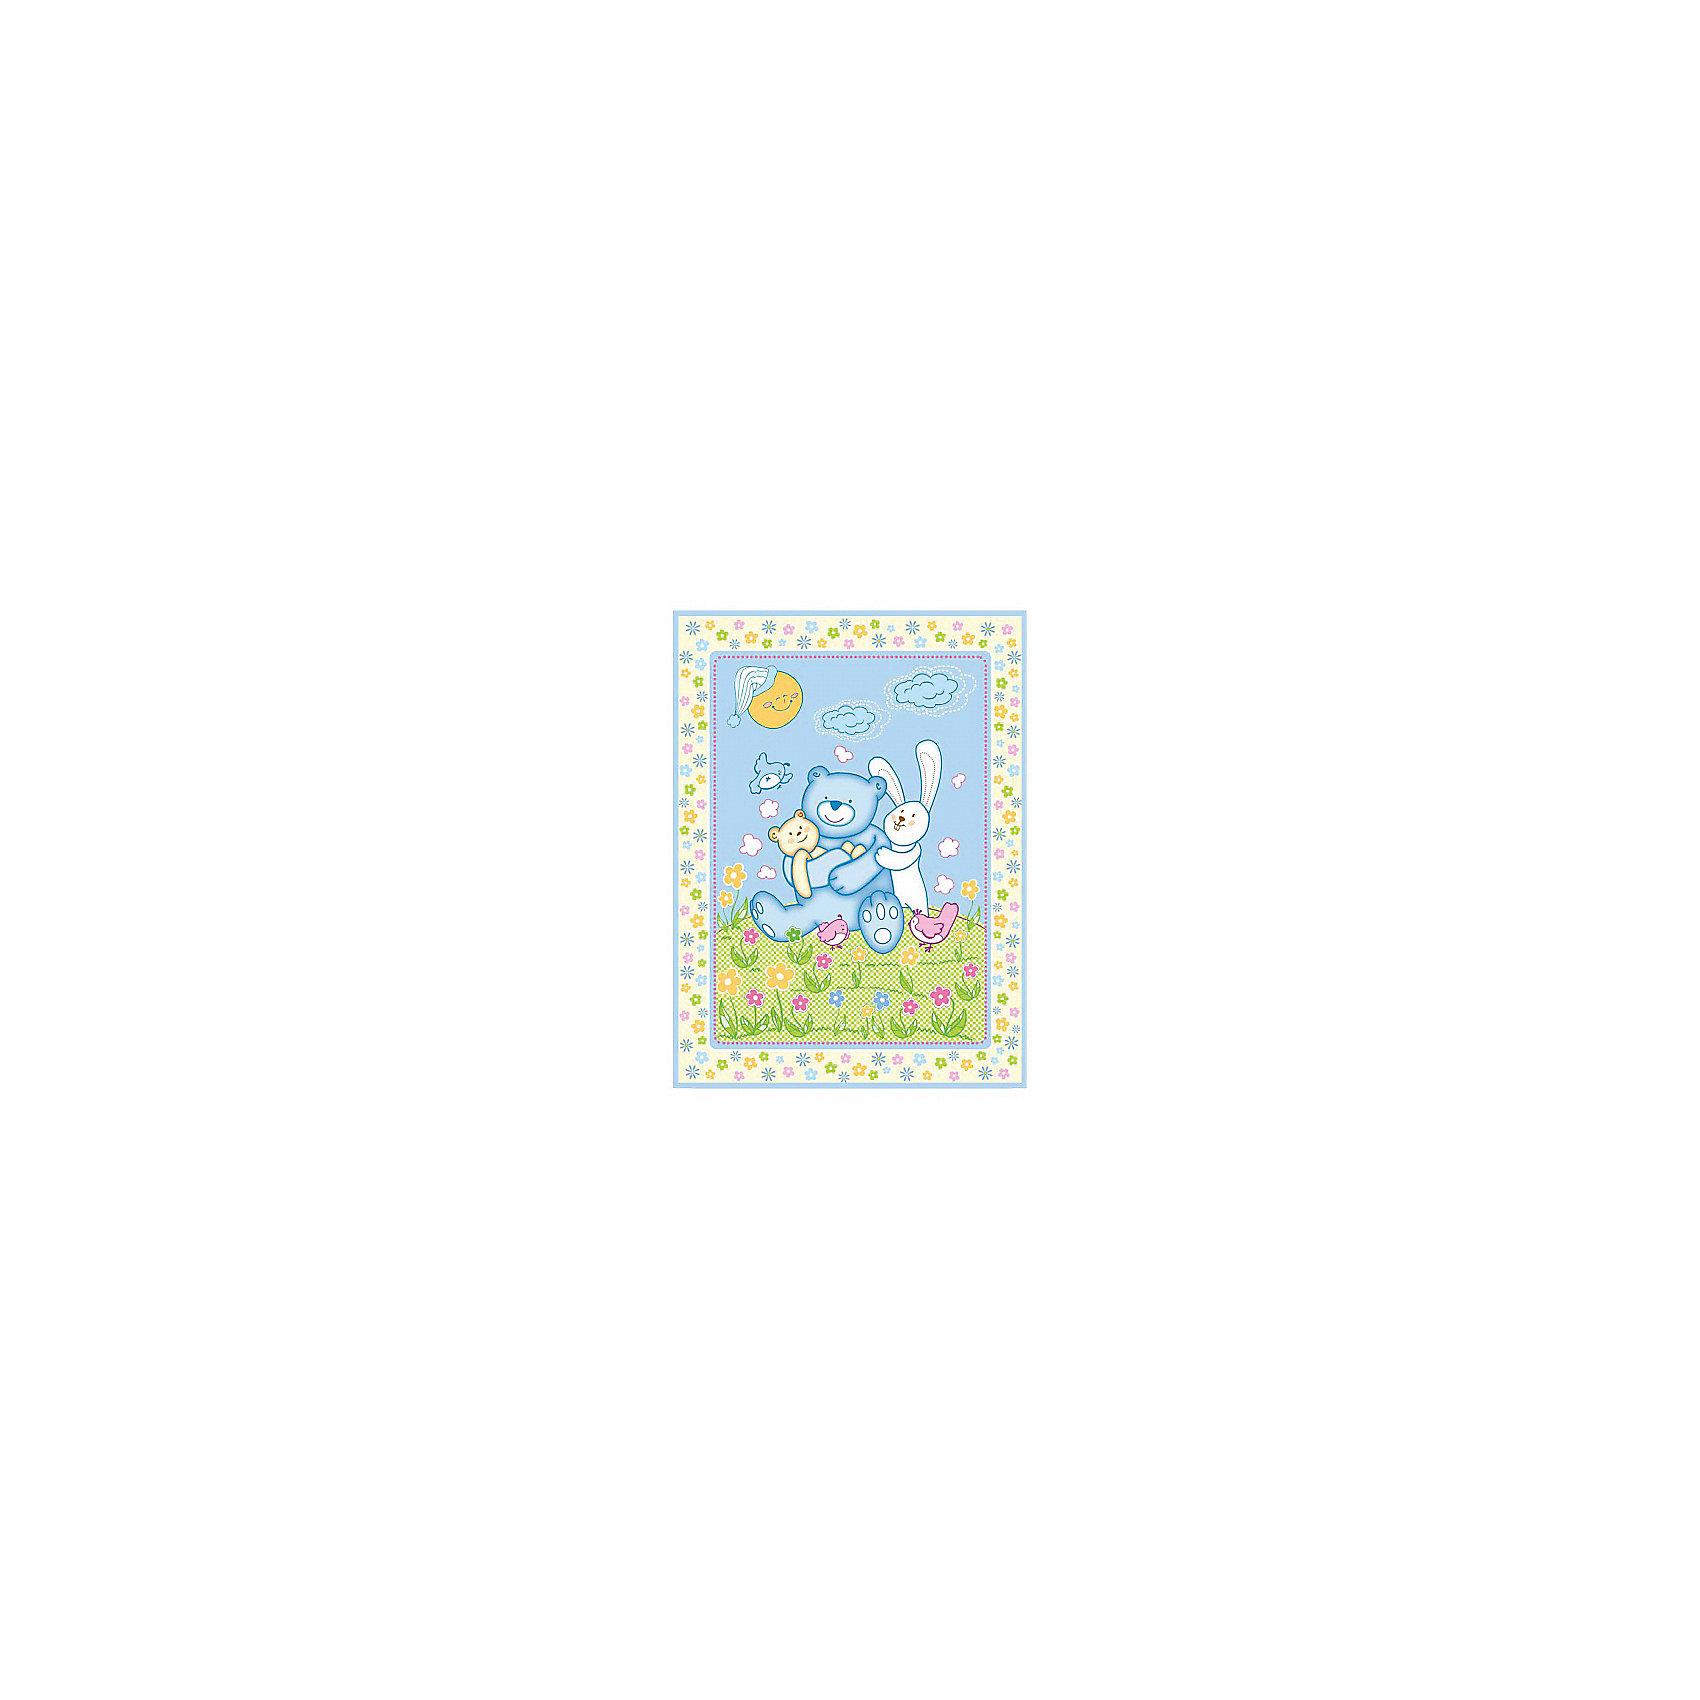 яло байковое Мишка на лужайке, 100х118 2-сторон., Baby Nice, голубой